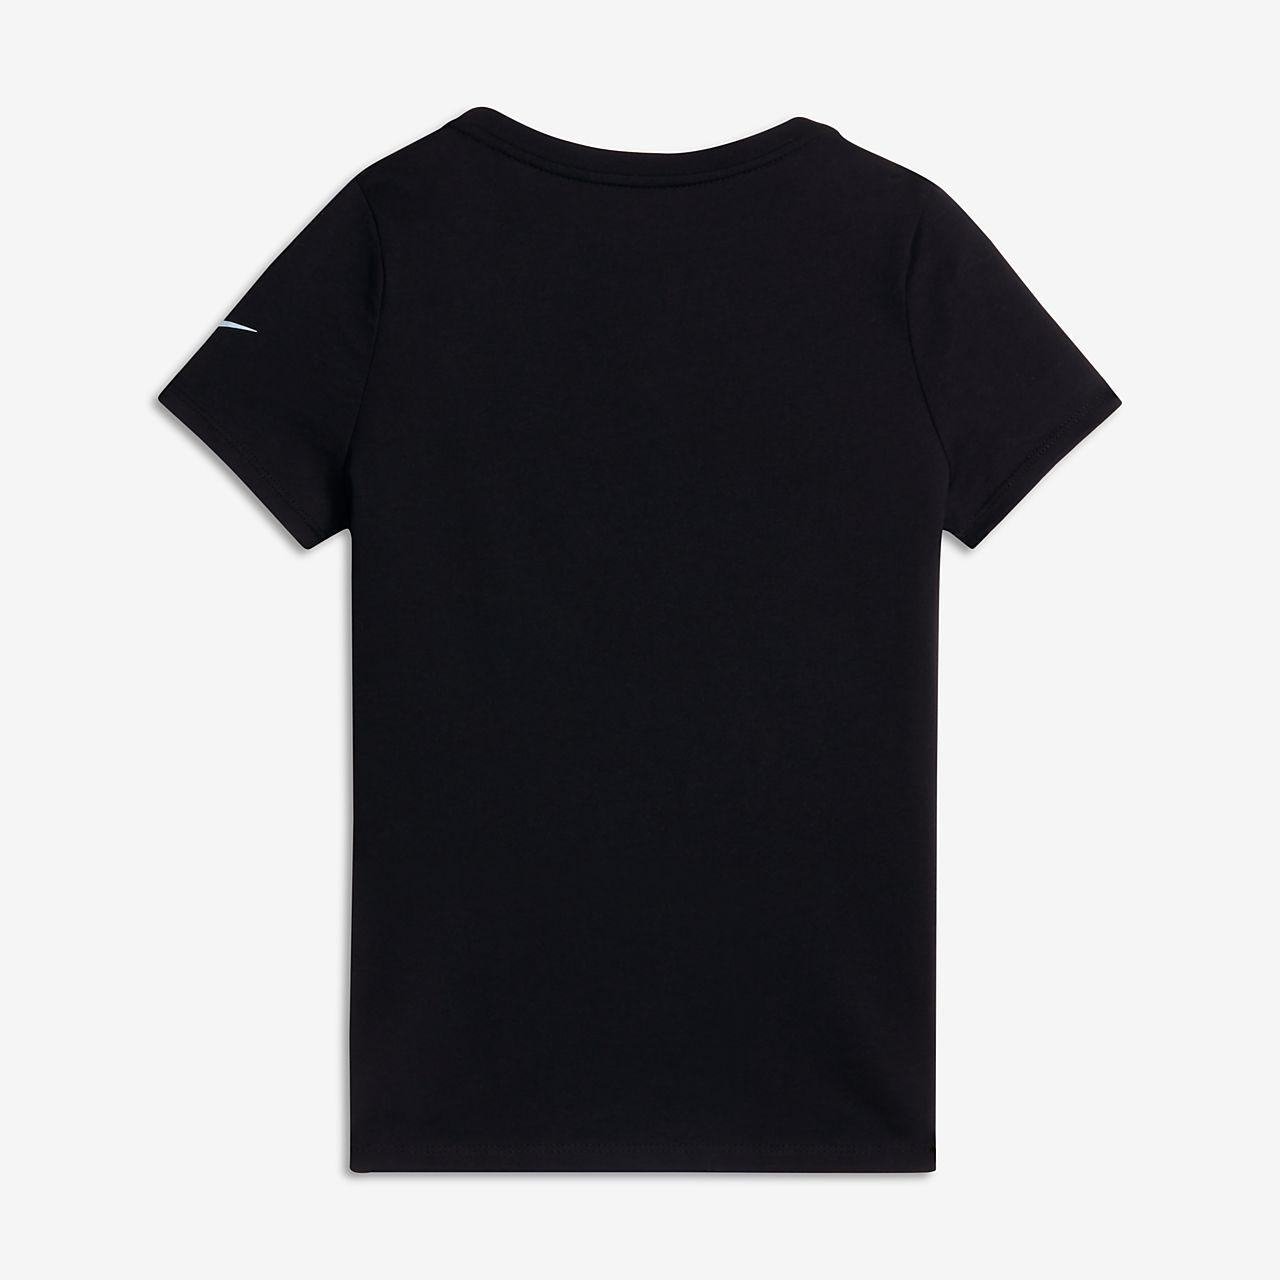 nike just do it shirt